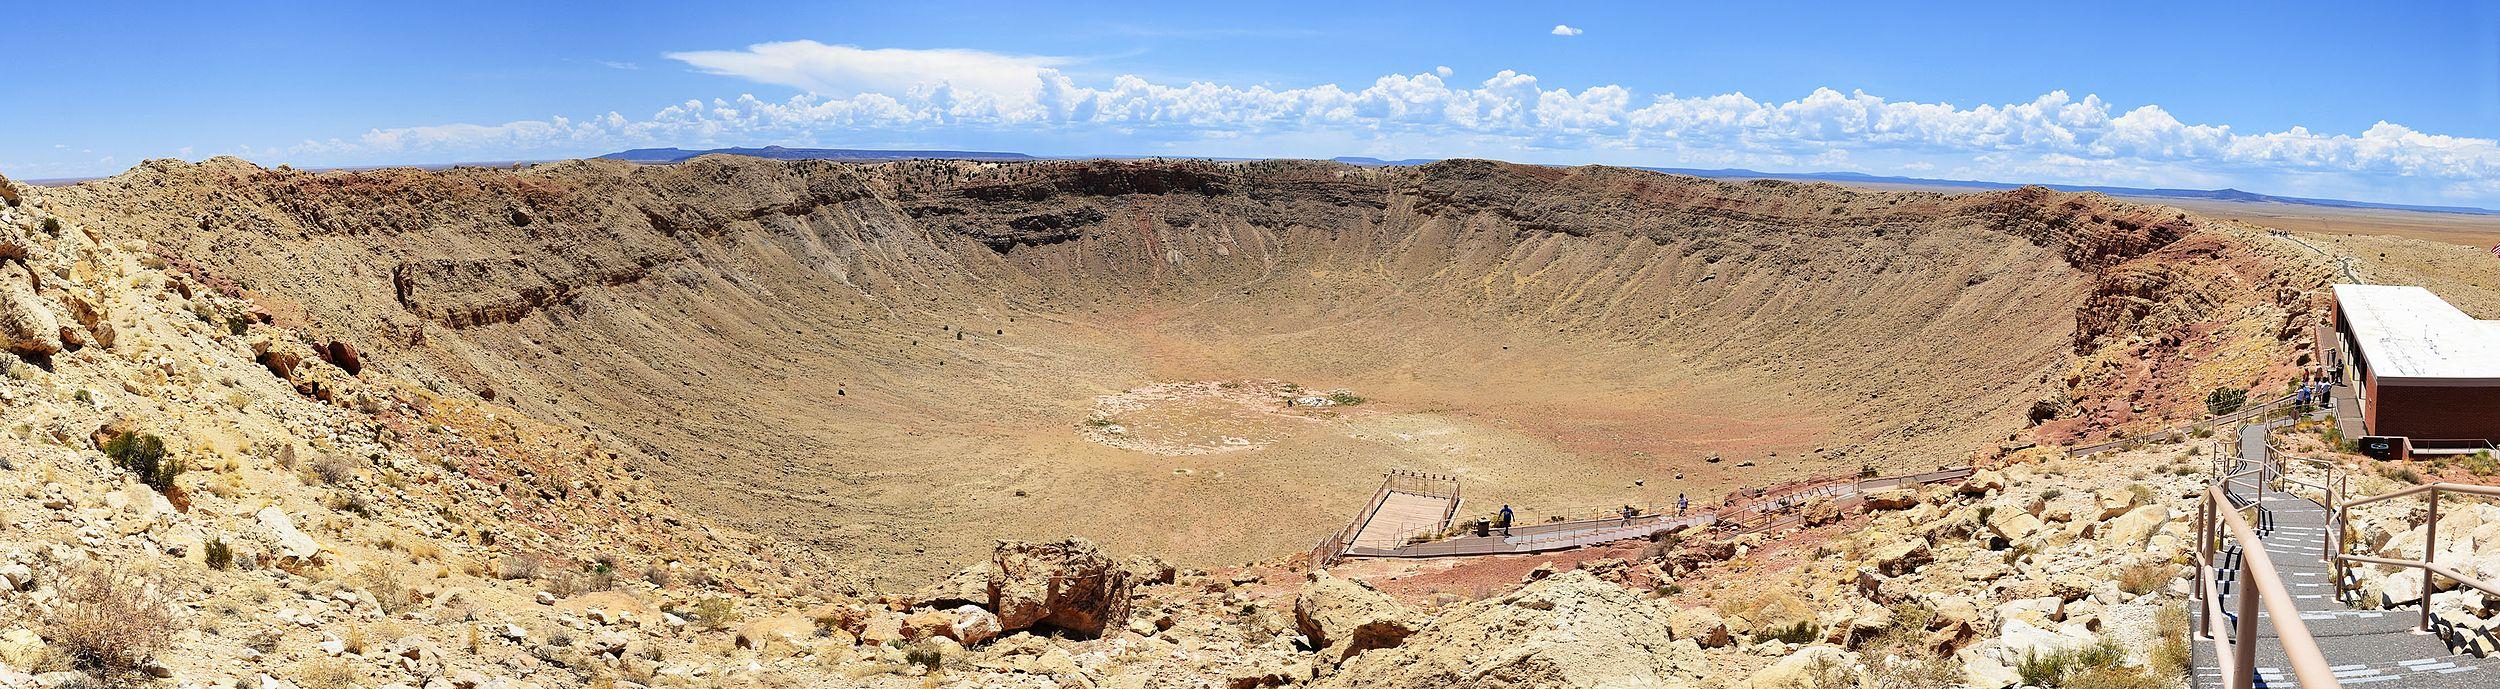 Meteor Crater, Near Winslow, Arizona  № 1143934 загрузить